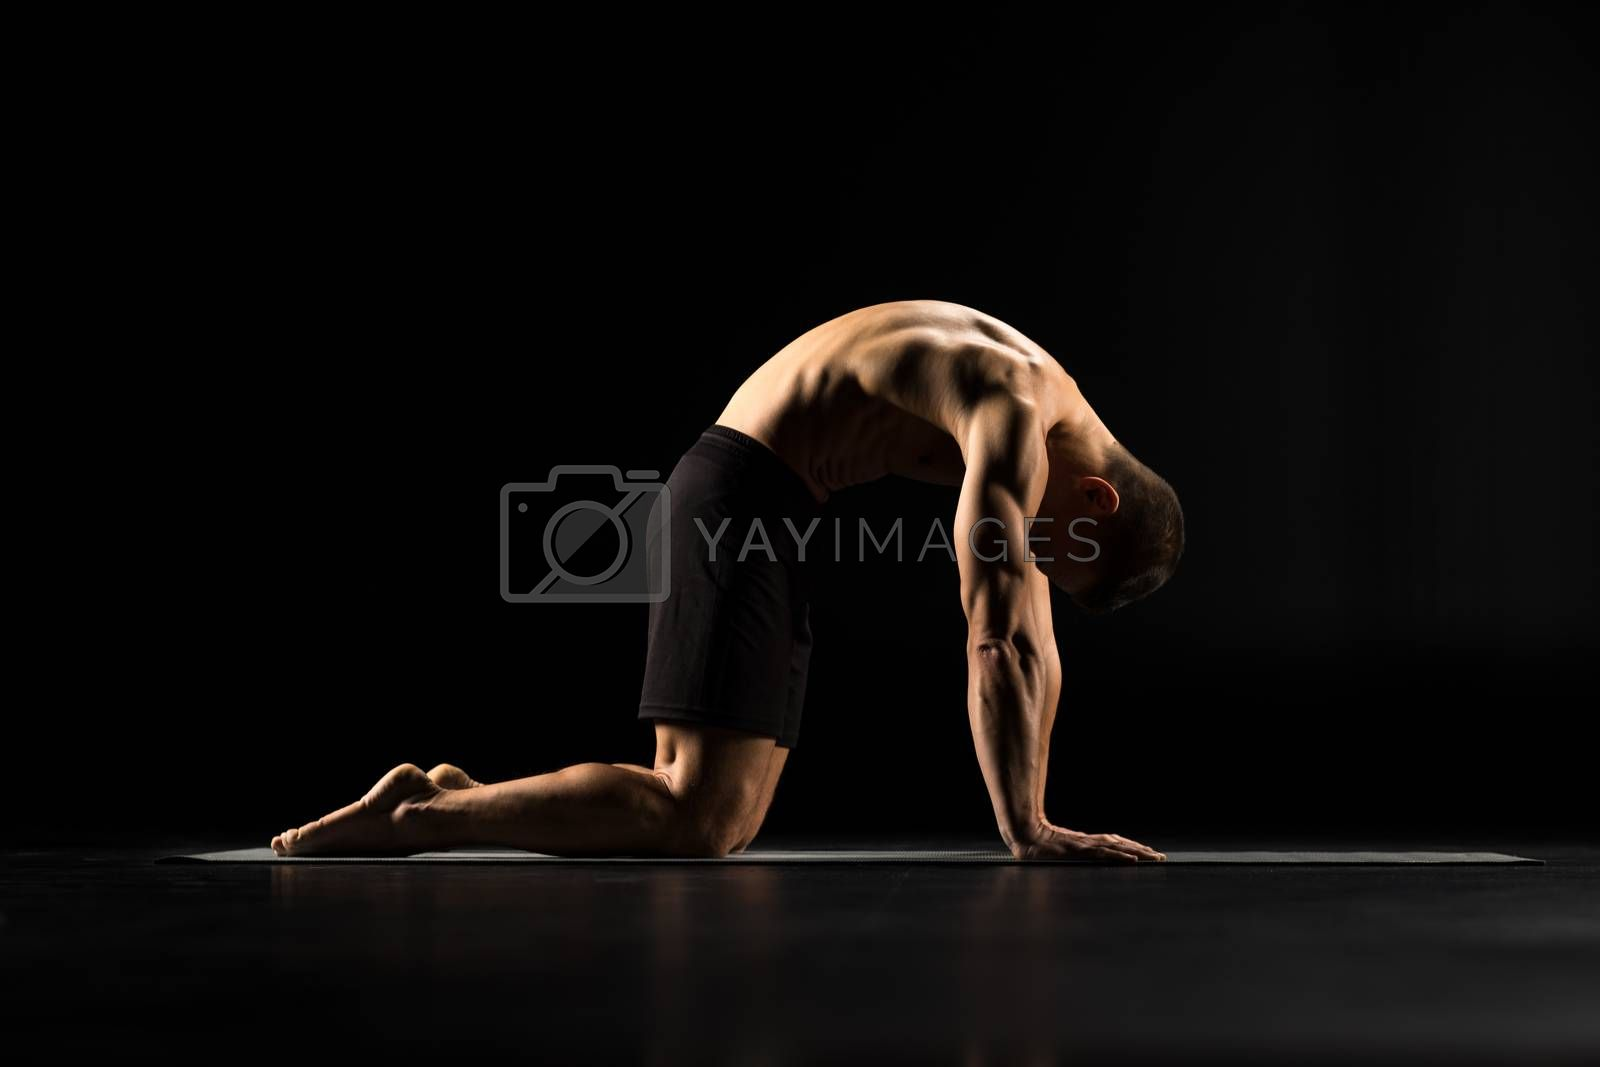 Man performing Marjariasana or Cat Pose on yoga mat